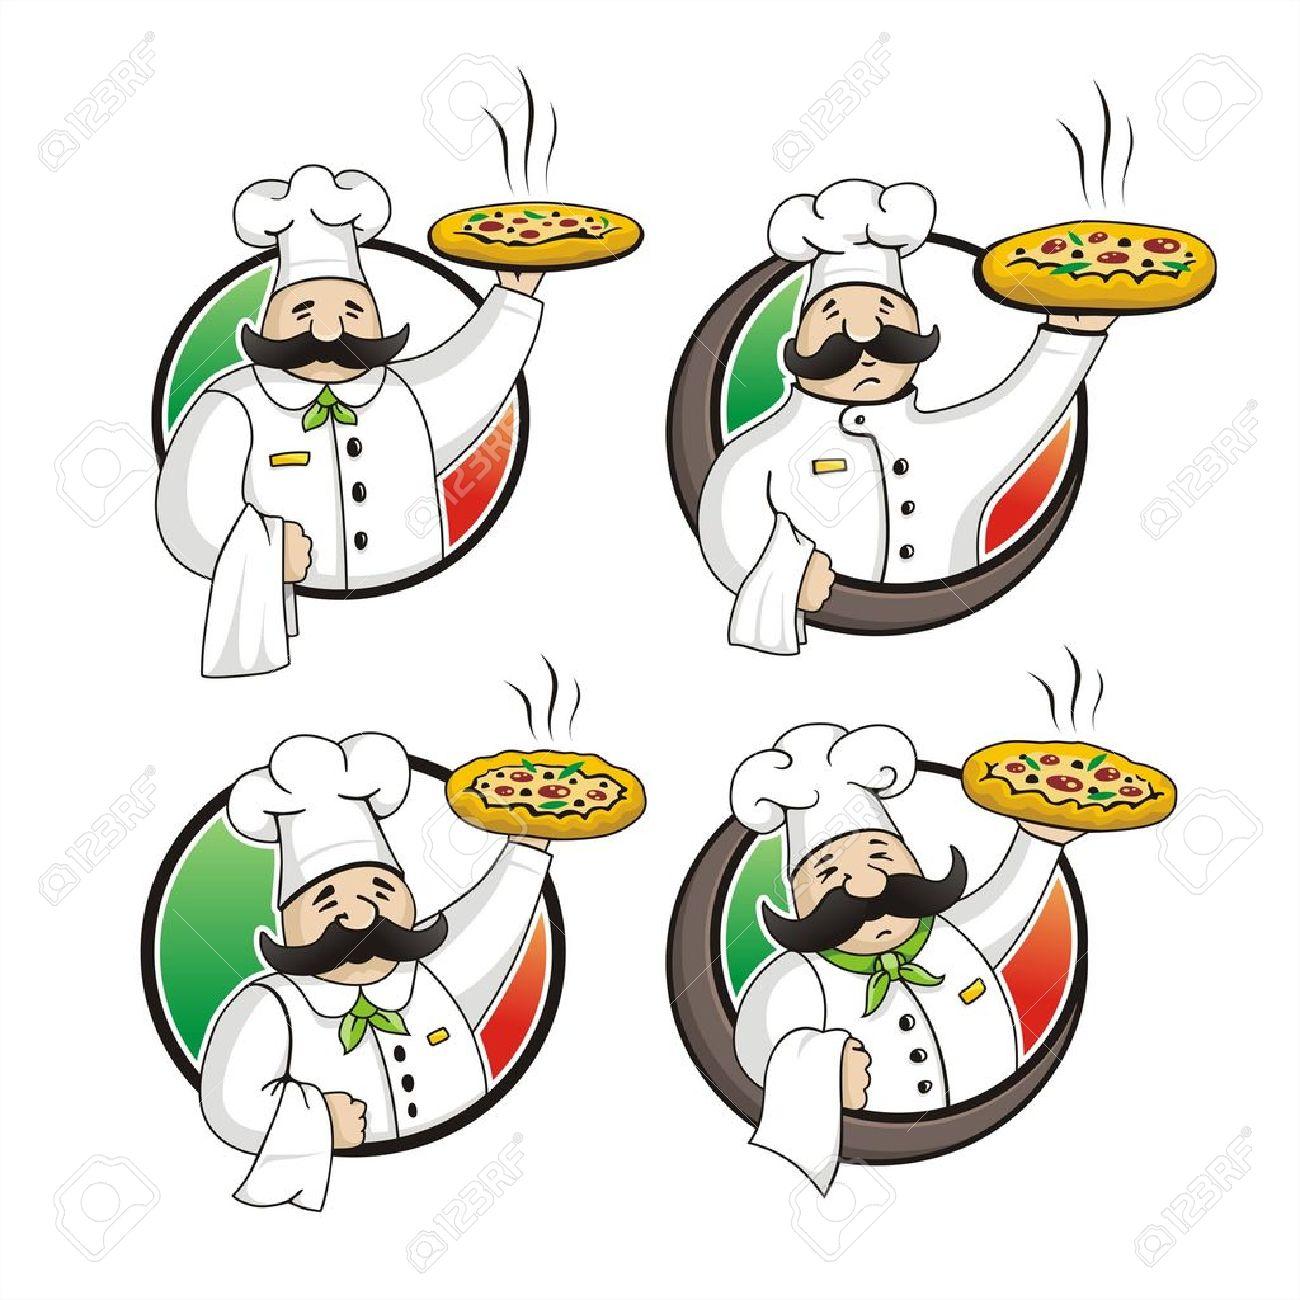 Pizzaiolo Vetor Royalty Free Cliparts, Vetores, E Ilustrações